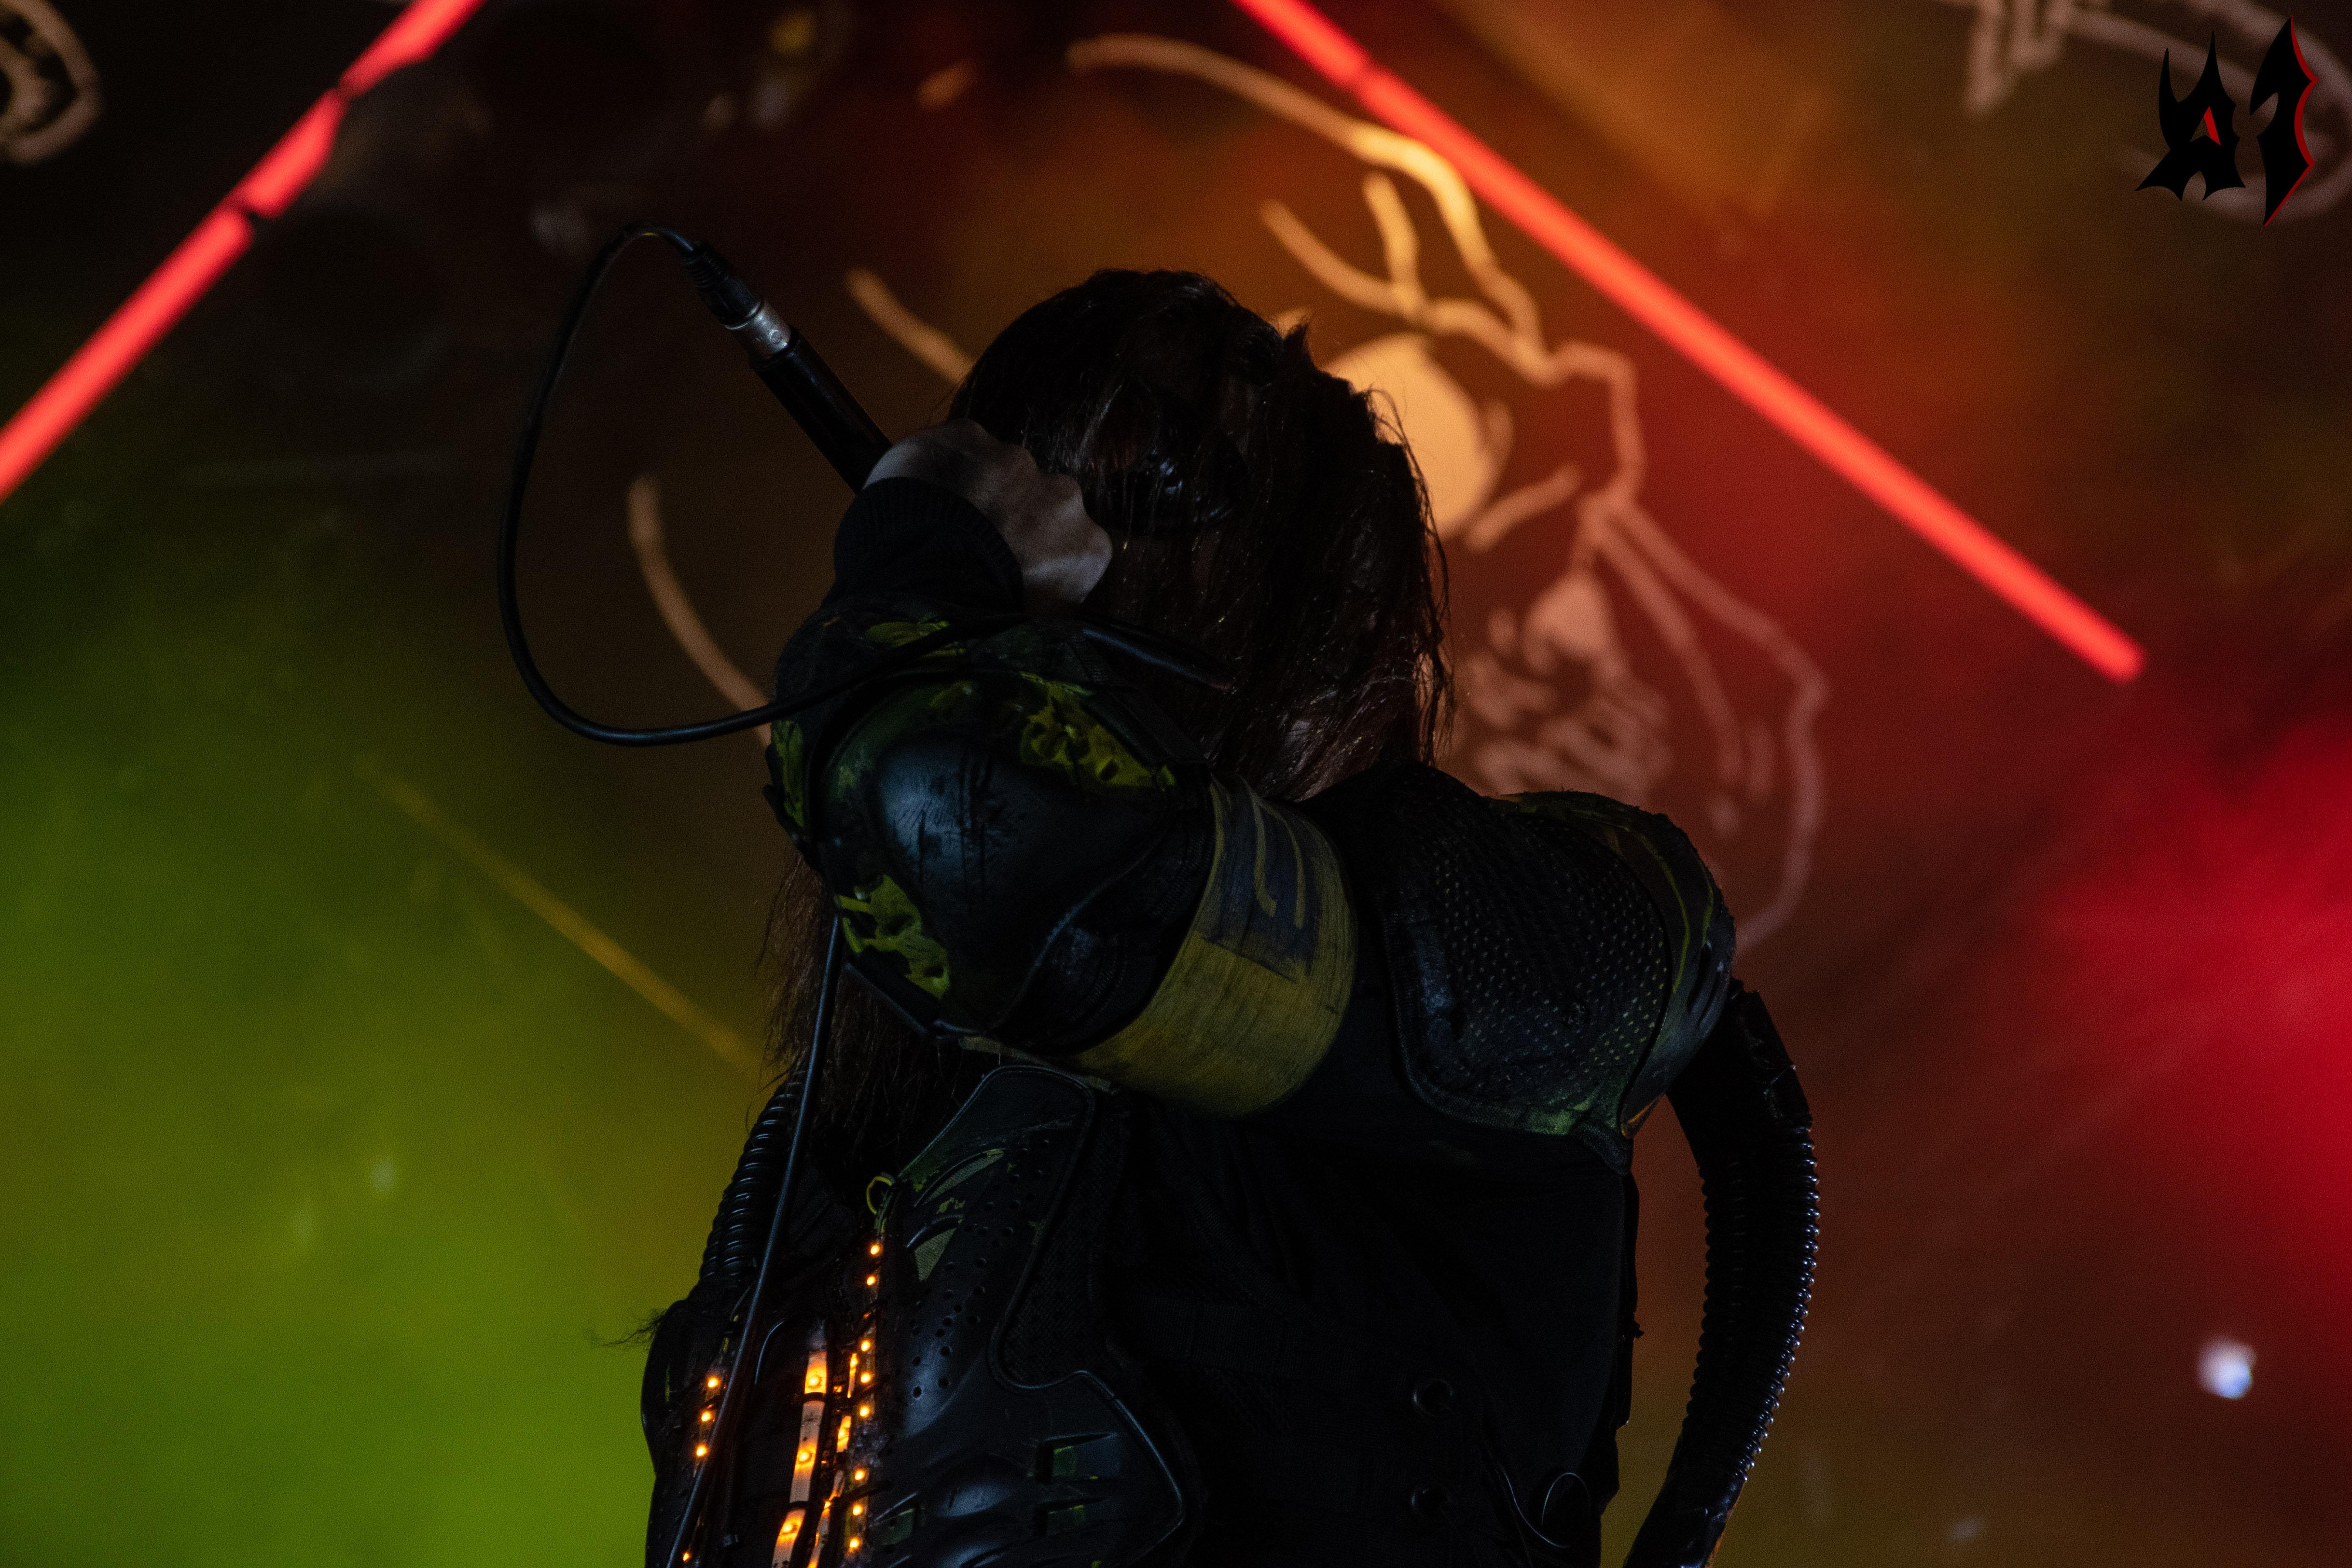 Hellfest - Cypecore - 19